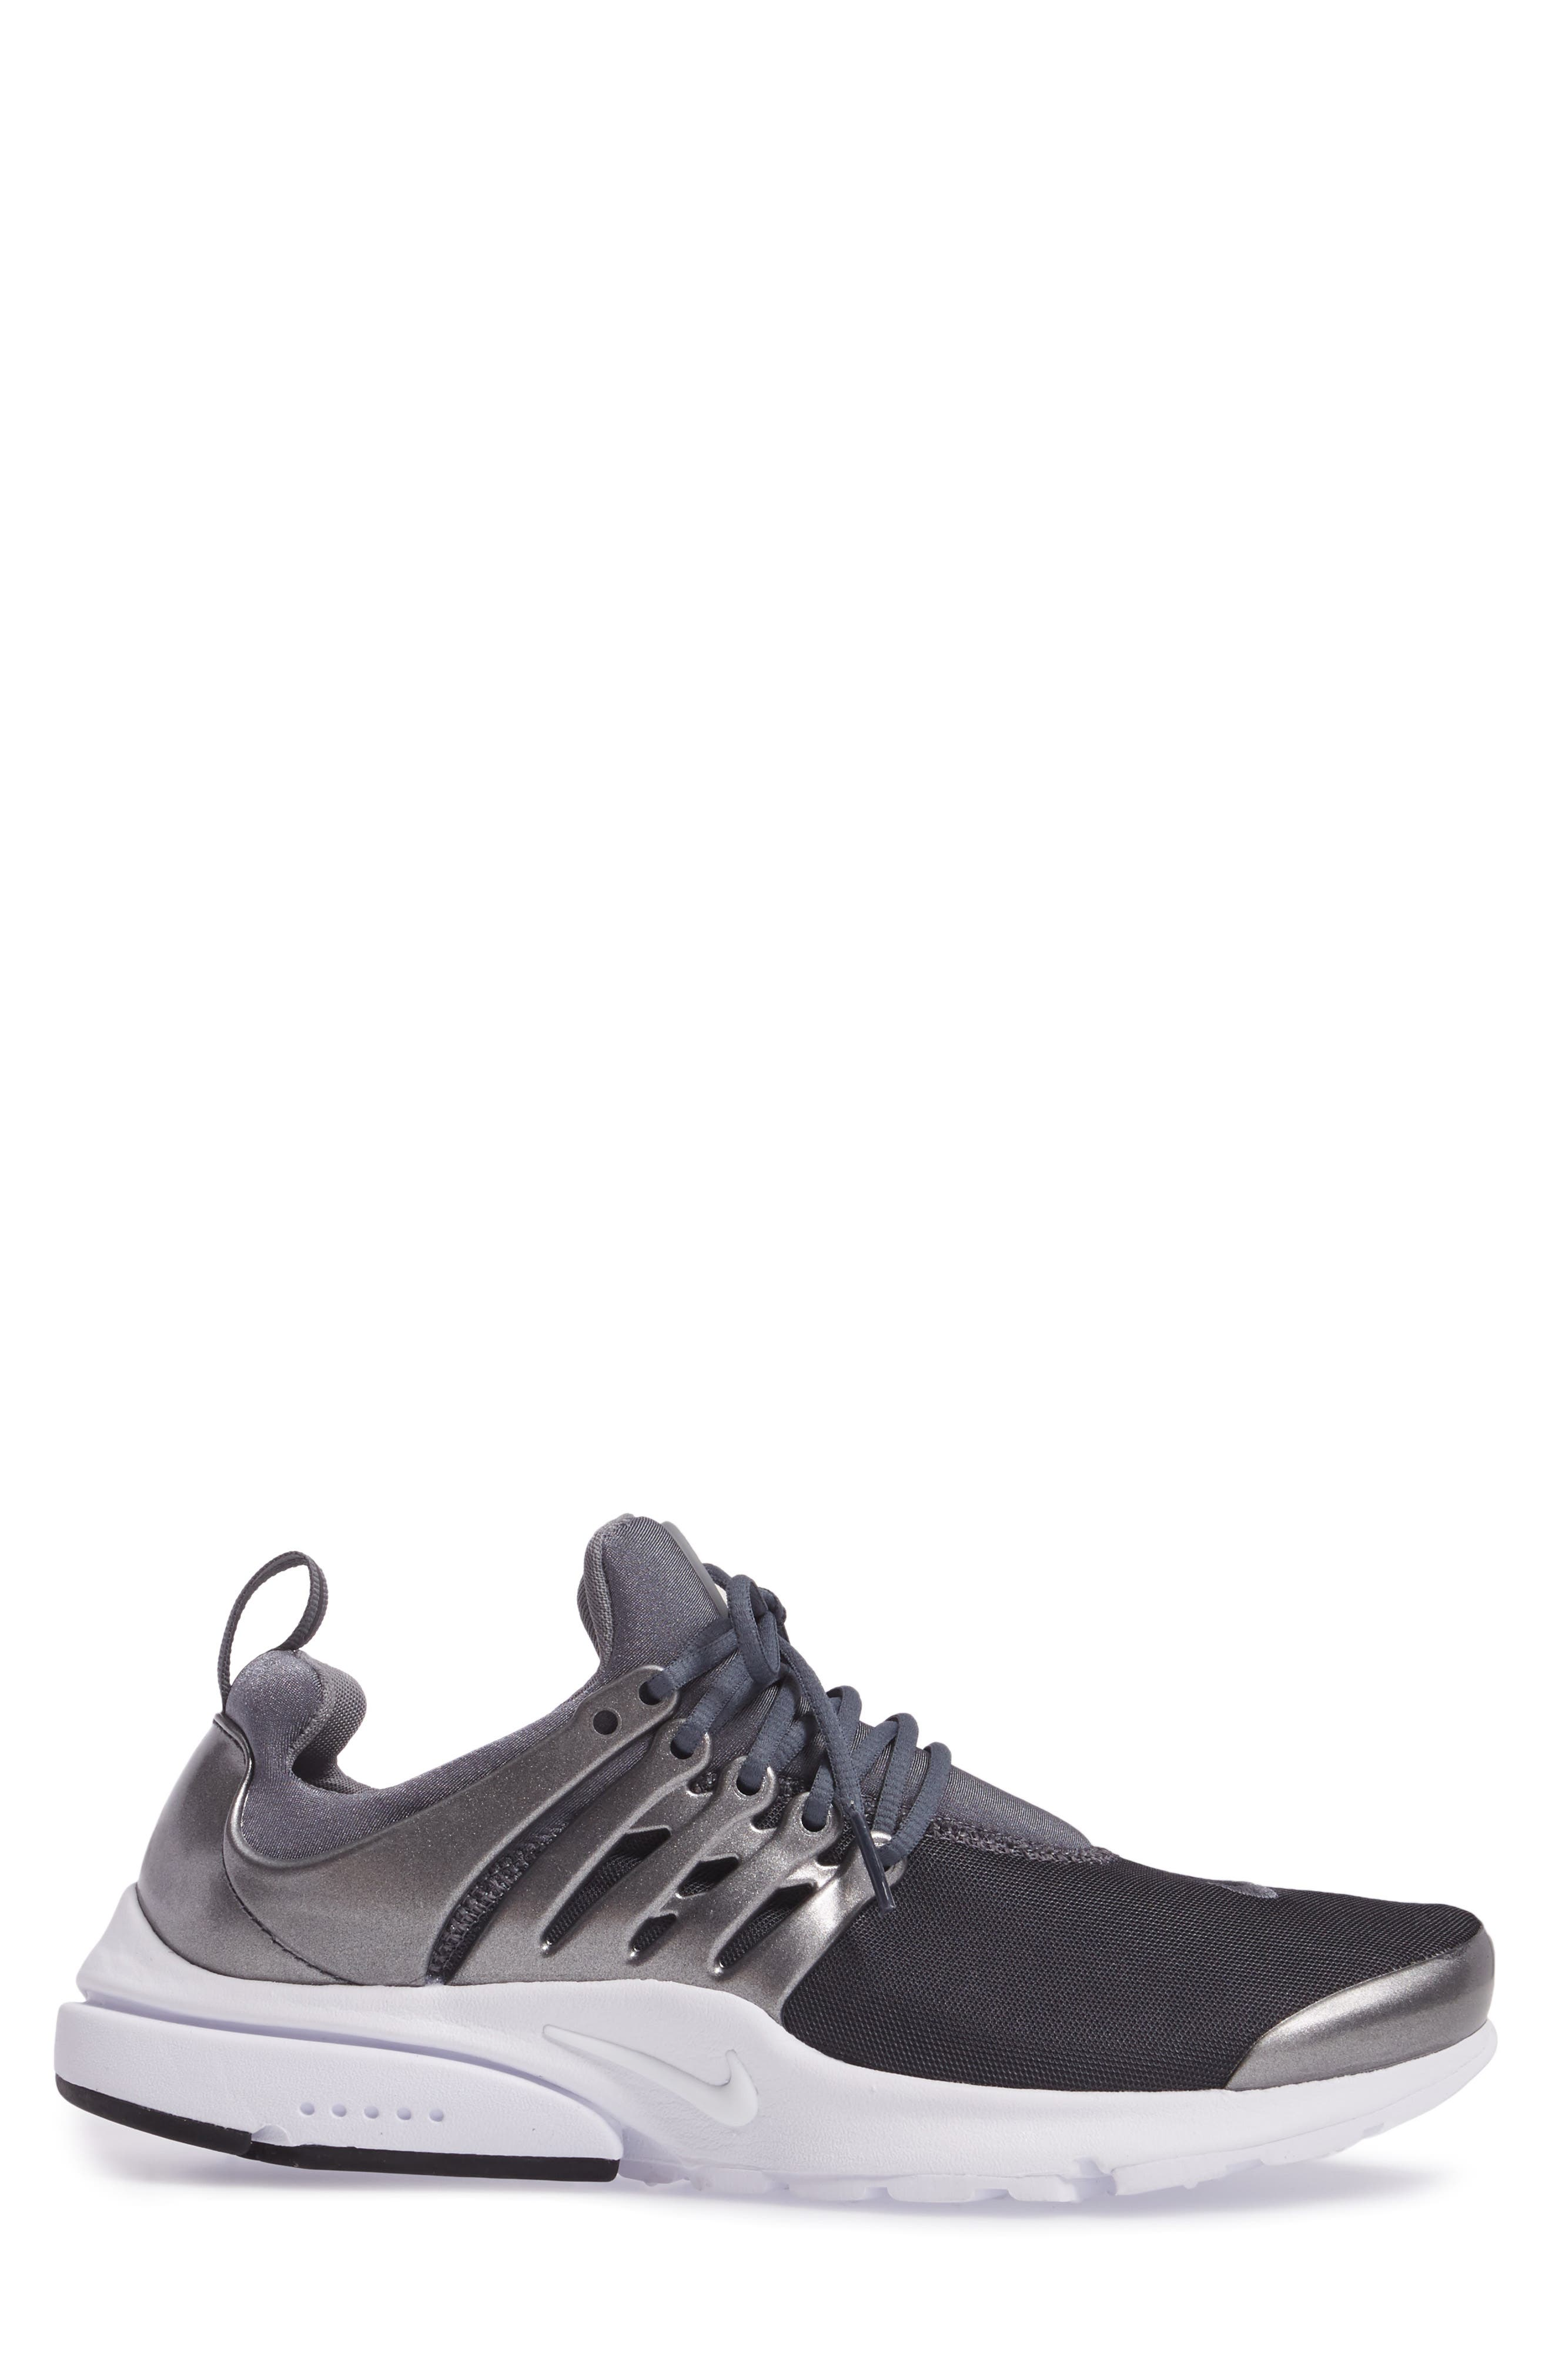 Alternate Image 3  - Nike Air Presto Premium Sneaker (Men)